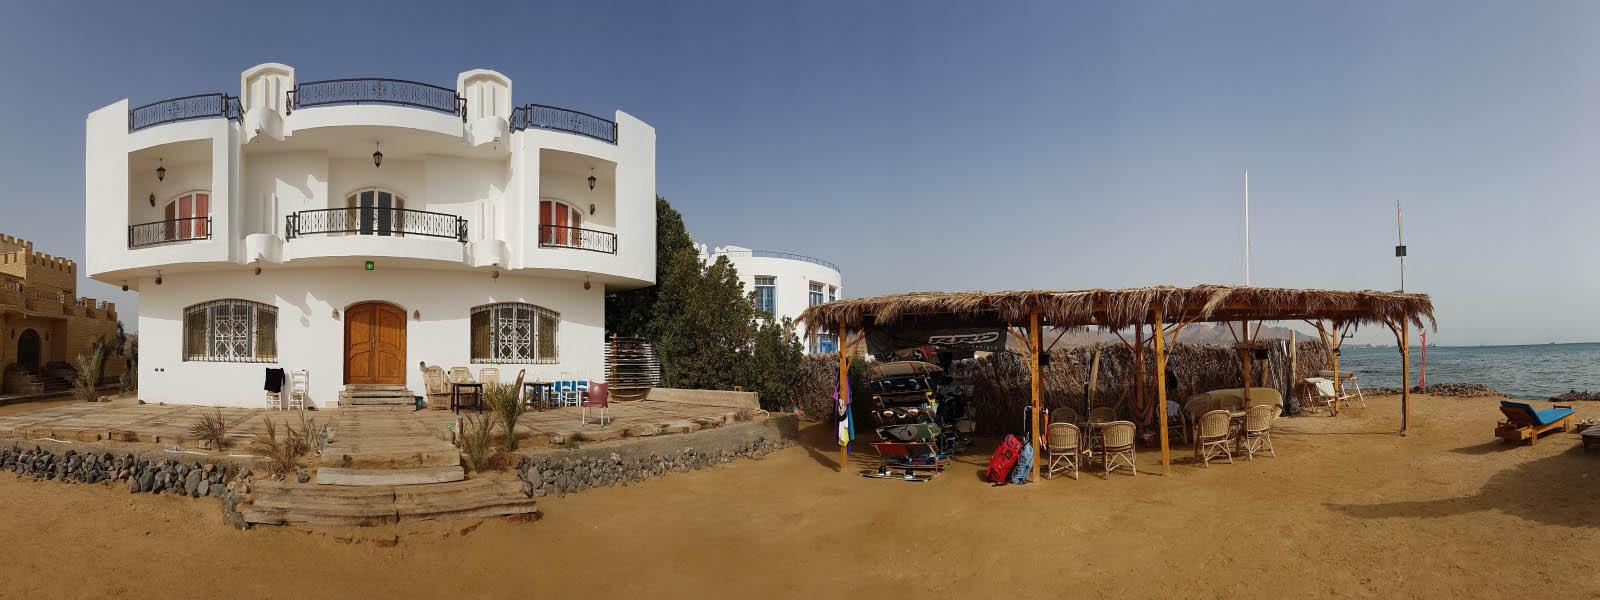 the kite villa